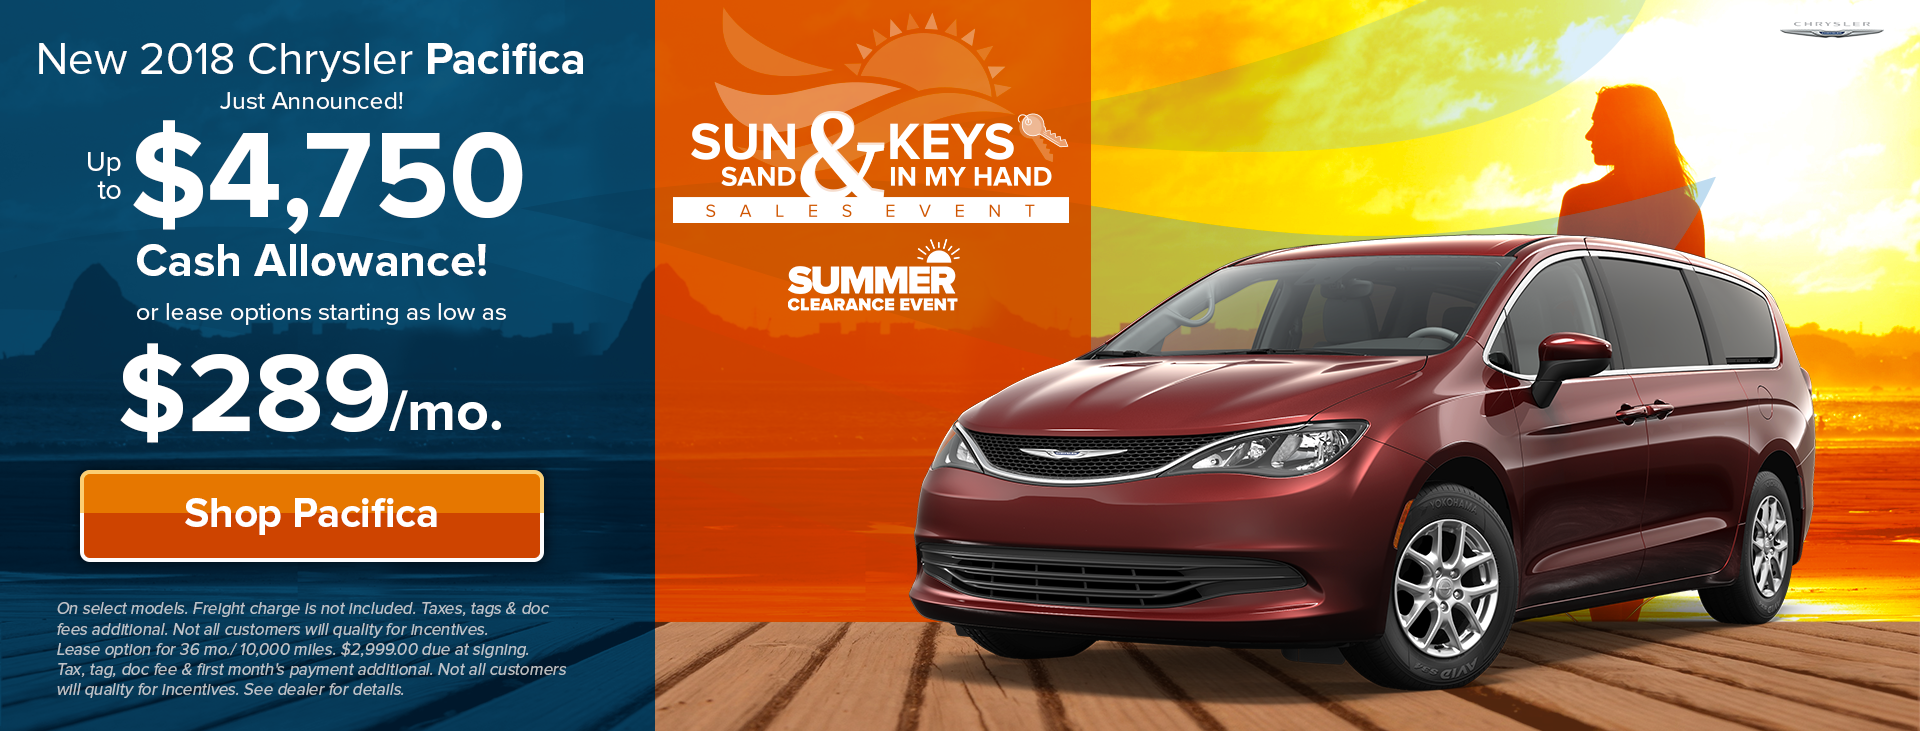 Sun, Sand & Chrysler Keys